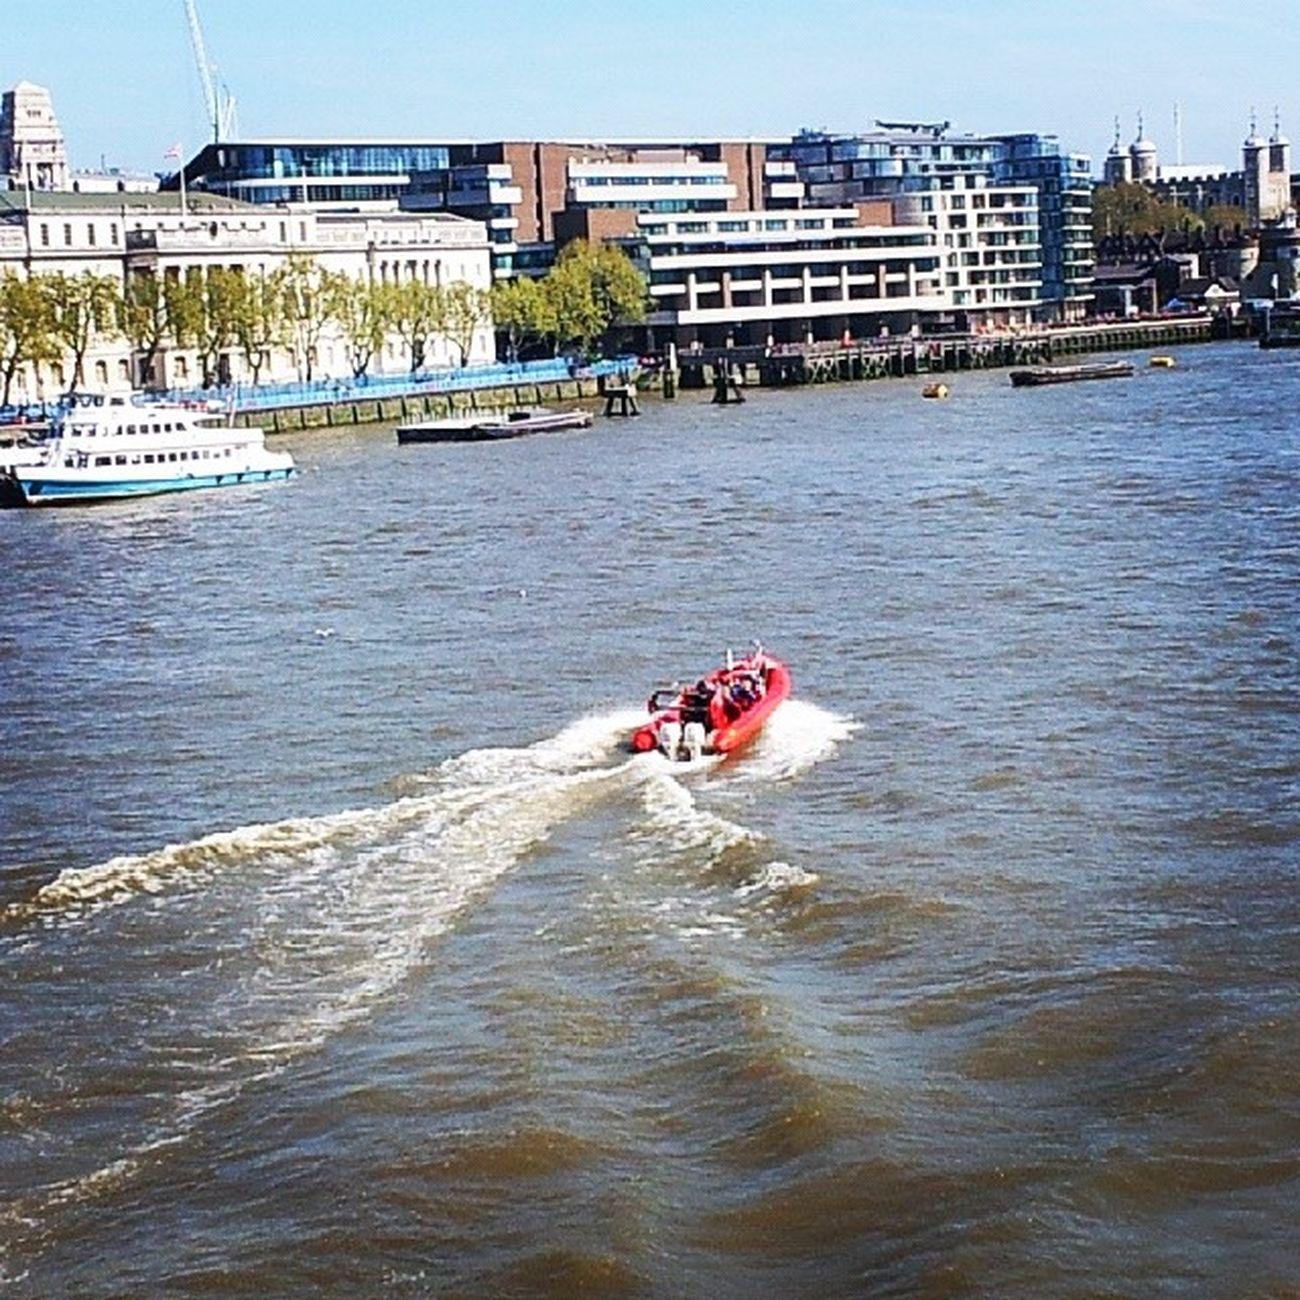 Boats Rivers Riverthames London Londonbridge Spring Water Waterlove Spring2014 Sunnyday Springwalk